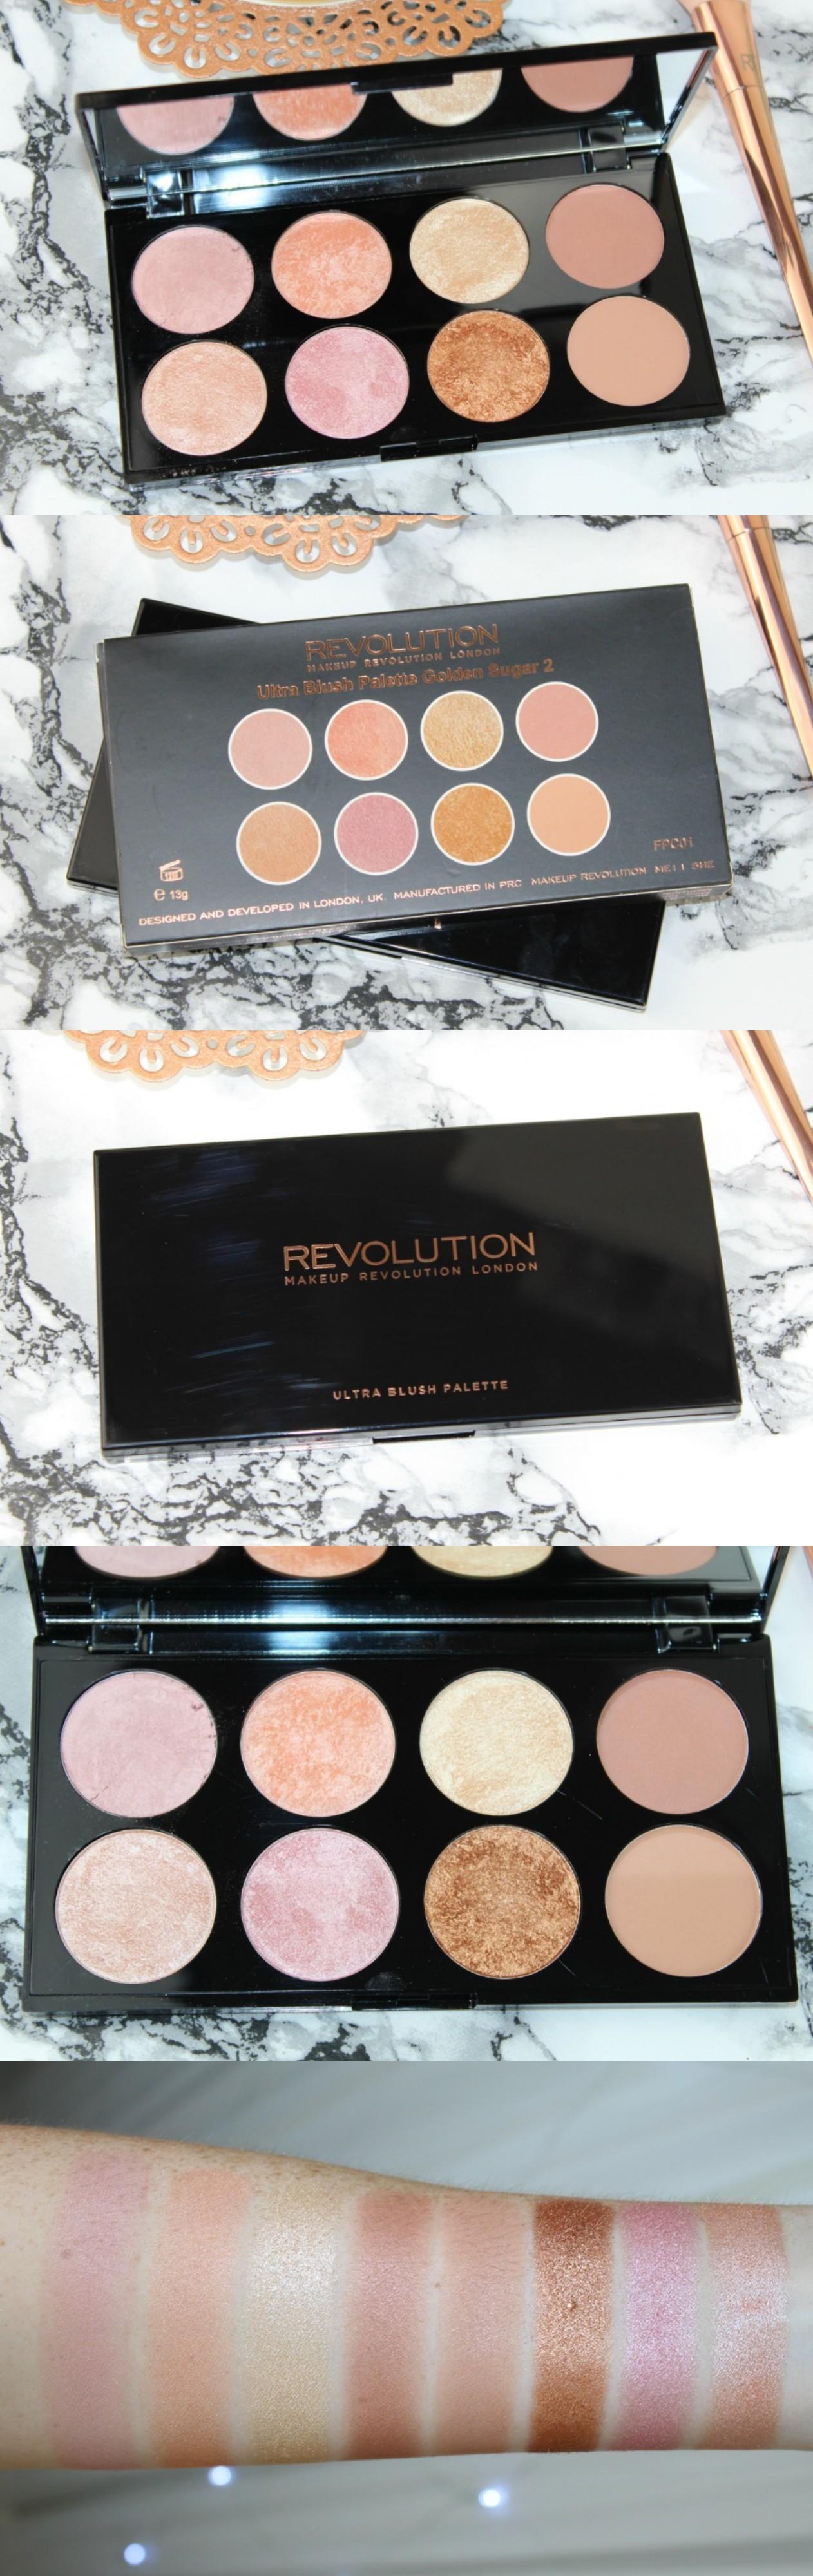 Revolution Golden Sugar 2 Rose Gold Review Photos - http://pinkparadisebeauty